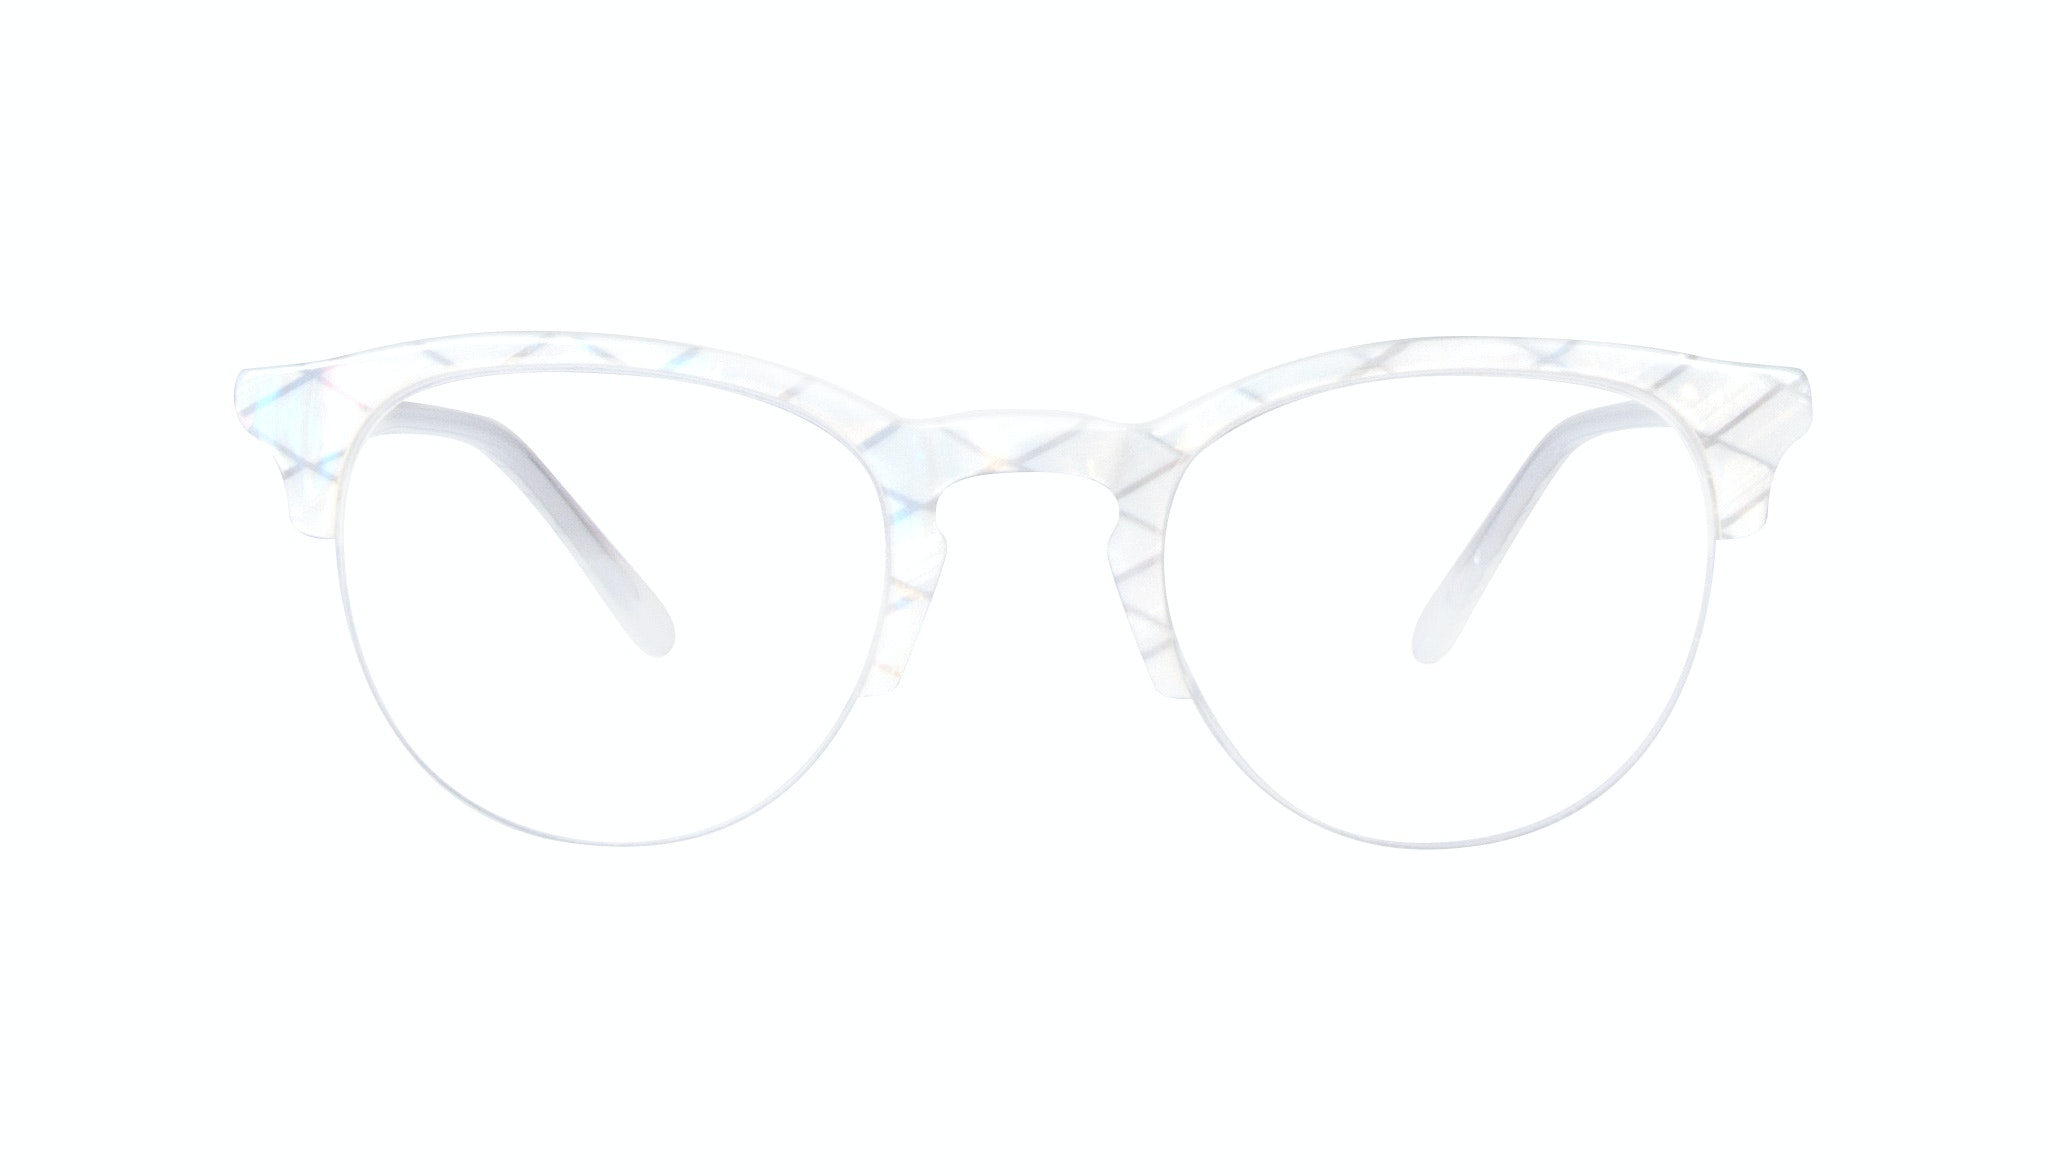 Affordable Fashion Glasses Round Semi-Rimless Eyeglasses Women Cult Light Opaline